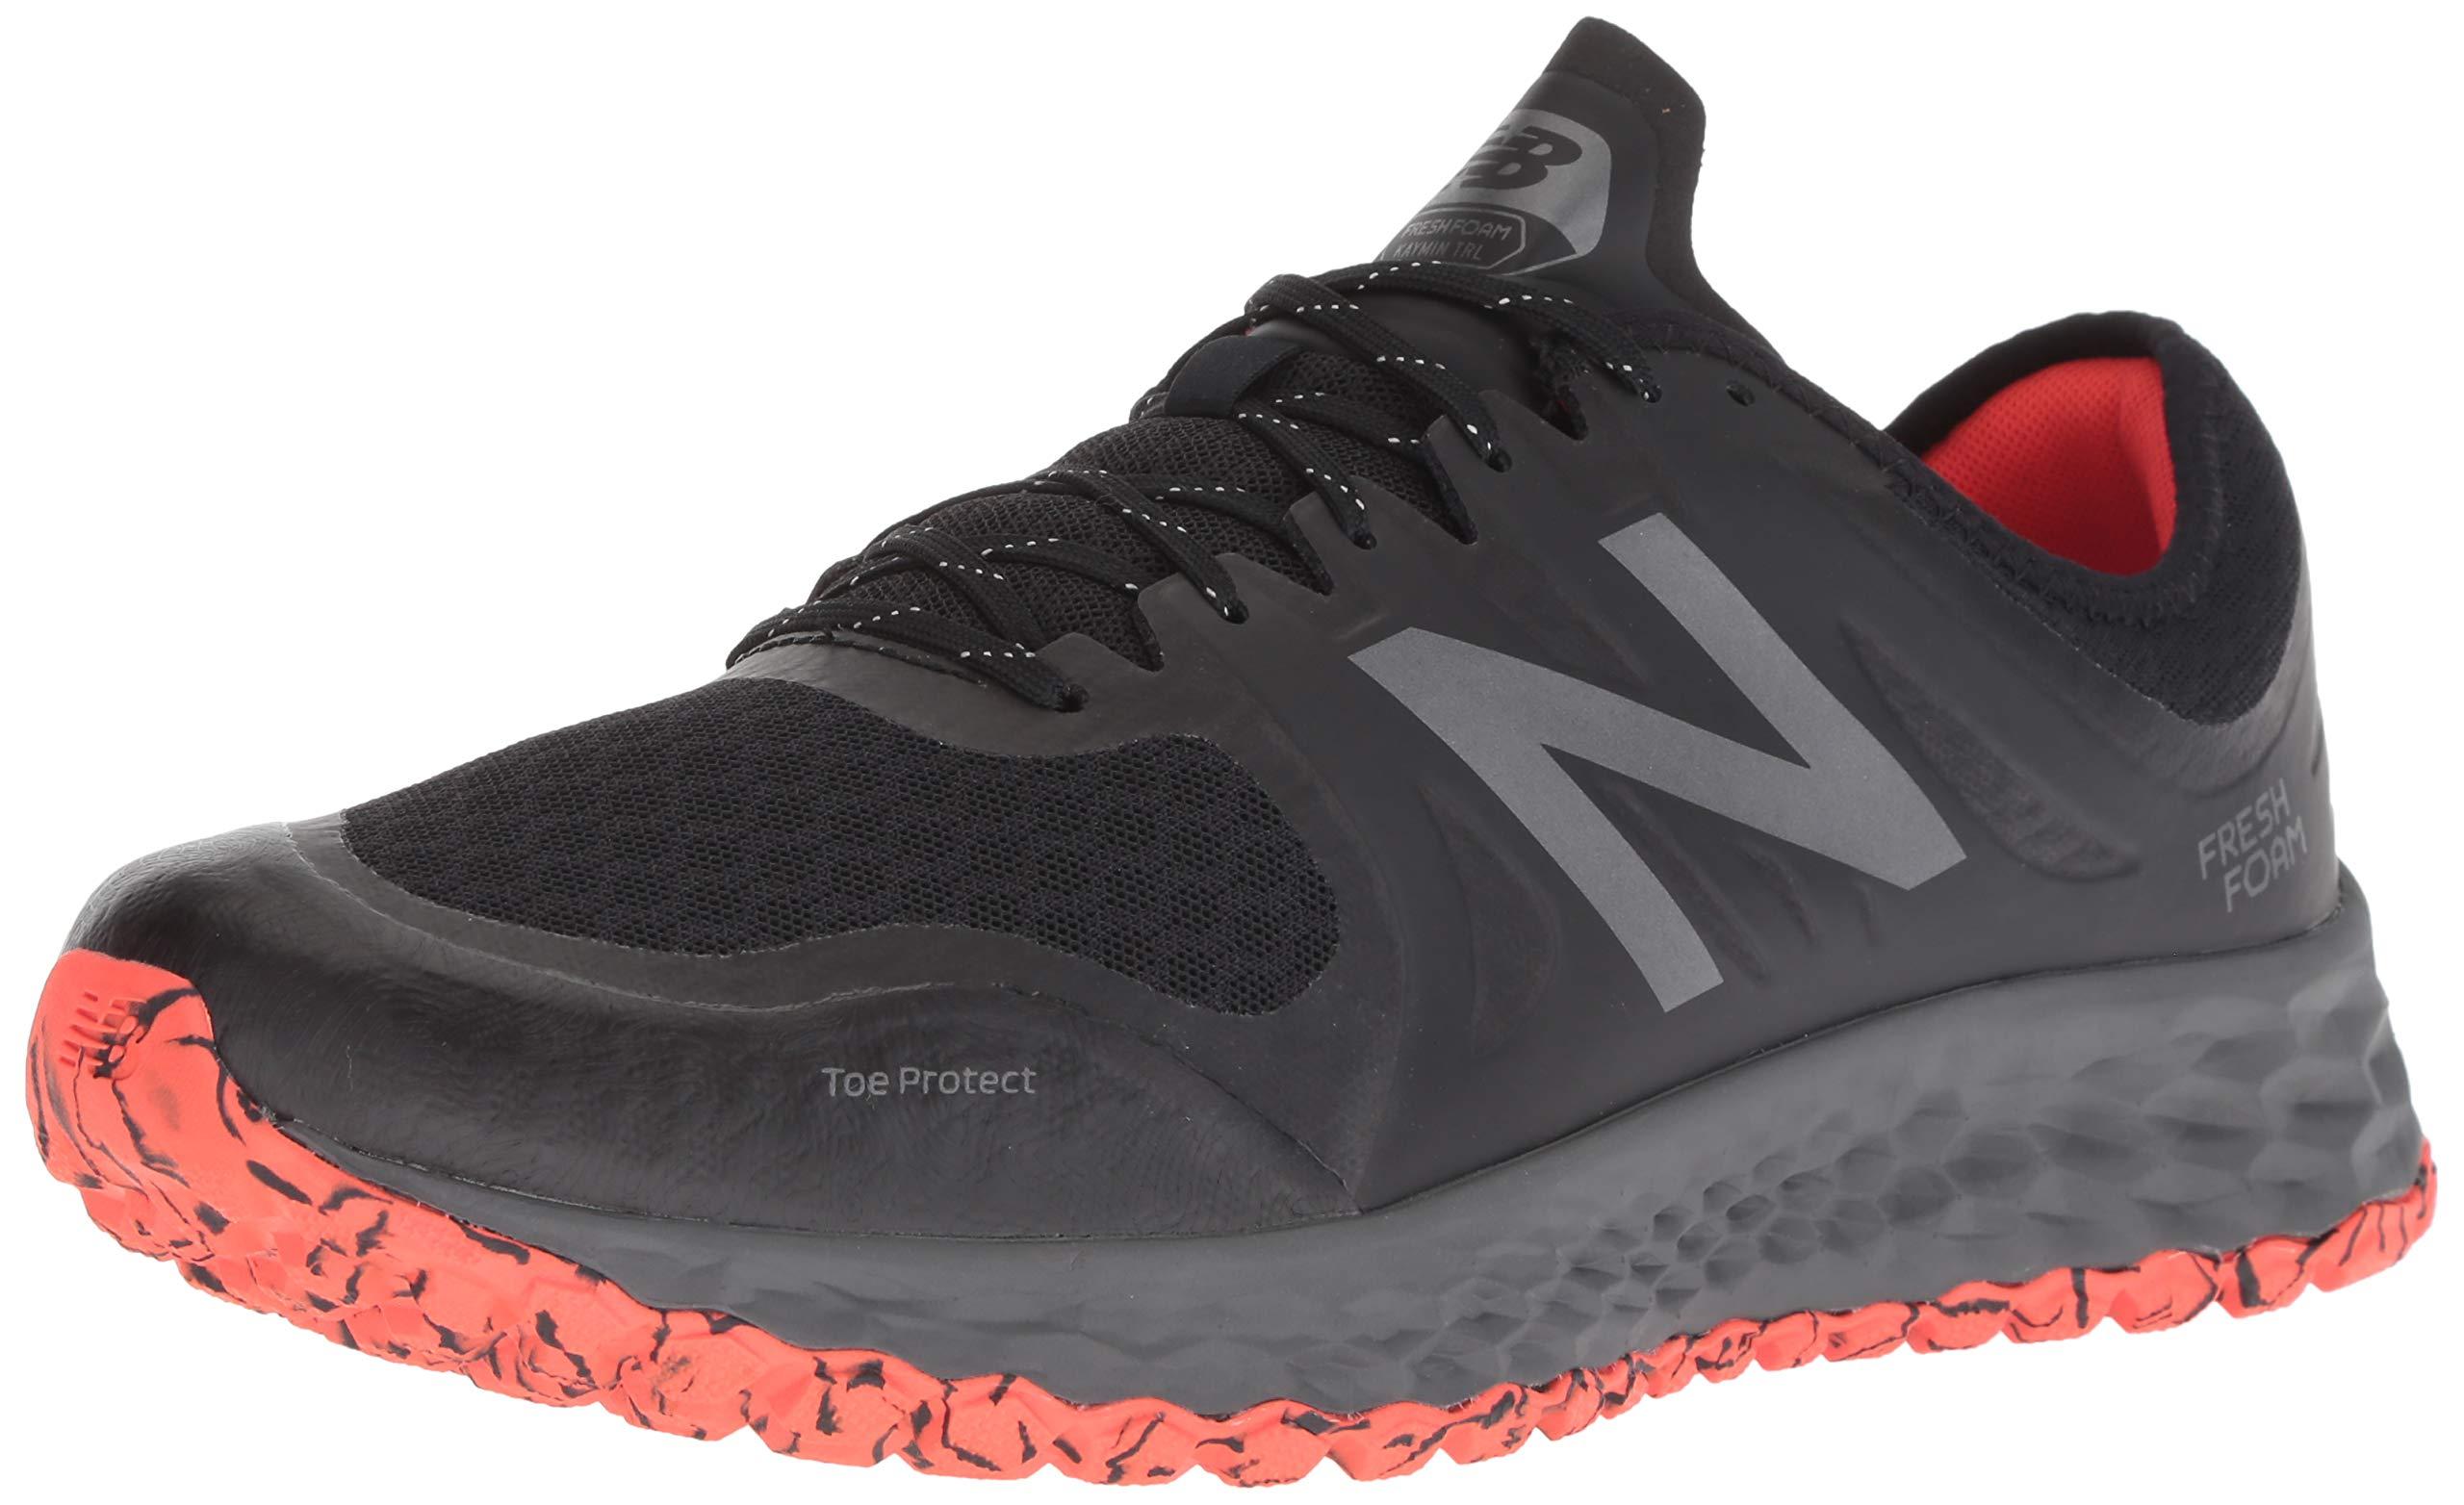 New Balance Men's Kaymin V1 Fresh Foam Trail Running Shoe, Black/Flame/Reflective, 1.5 D US by New Balance (Image #1)